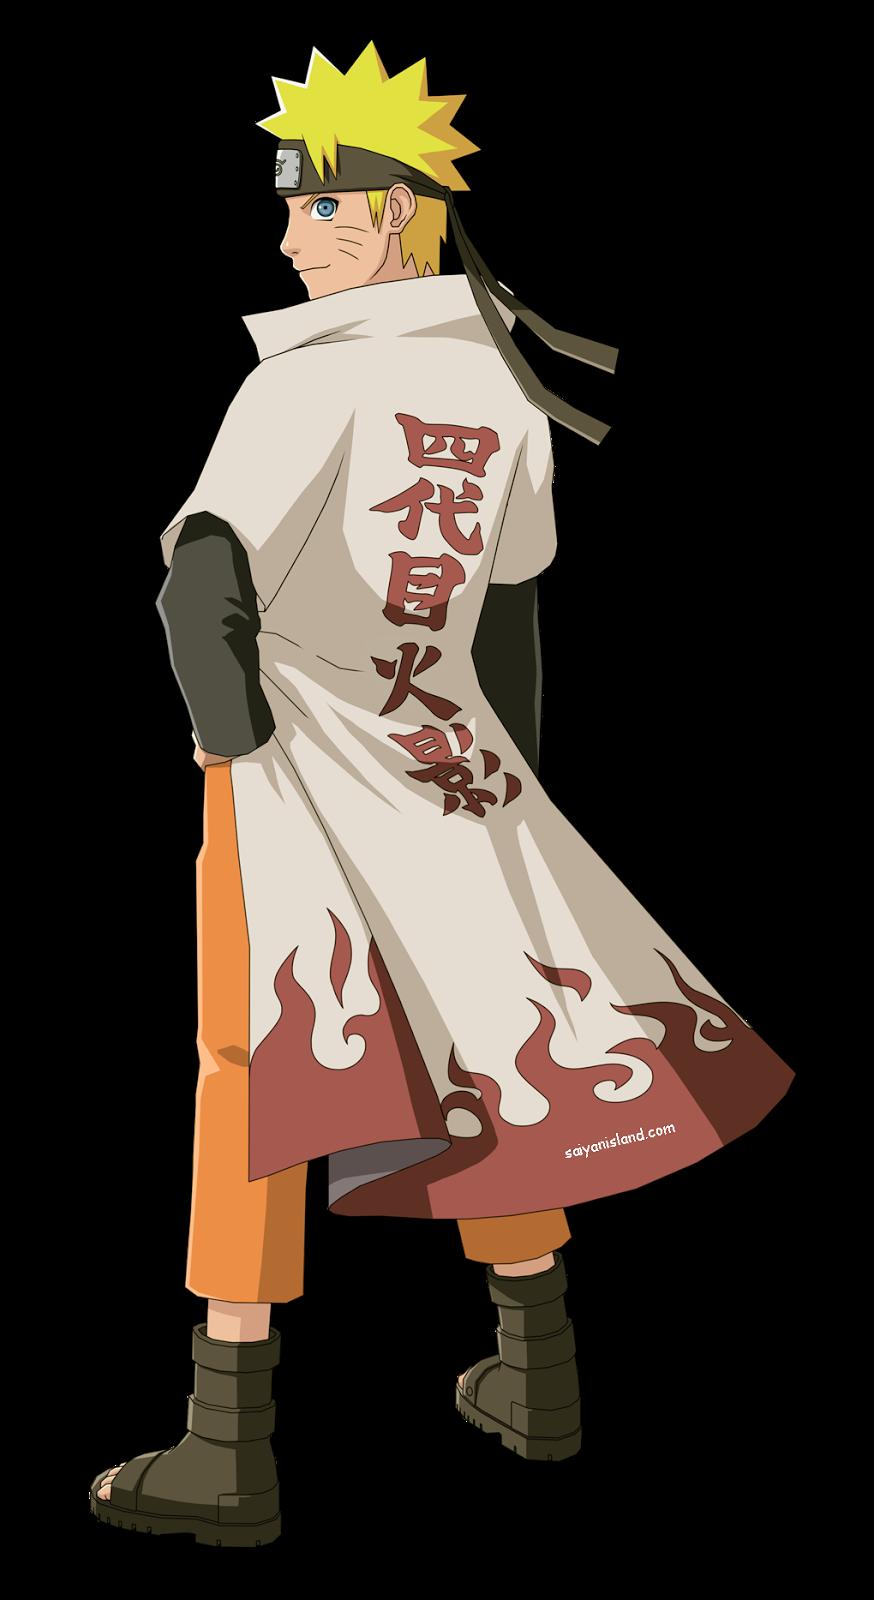 Naruto - PNG Naruto